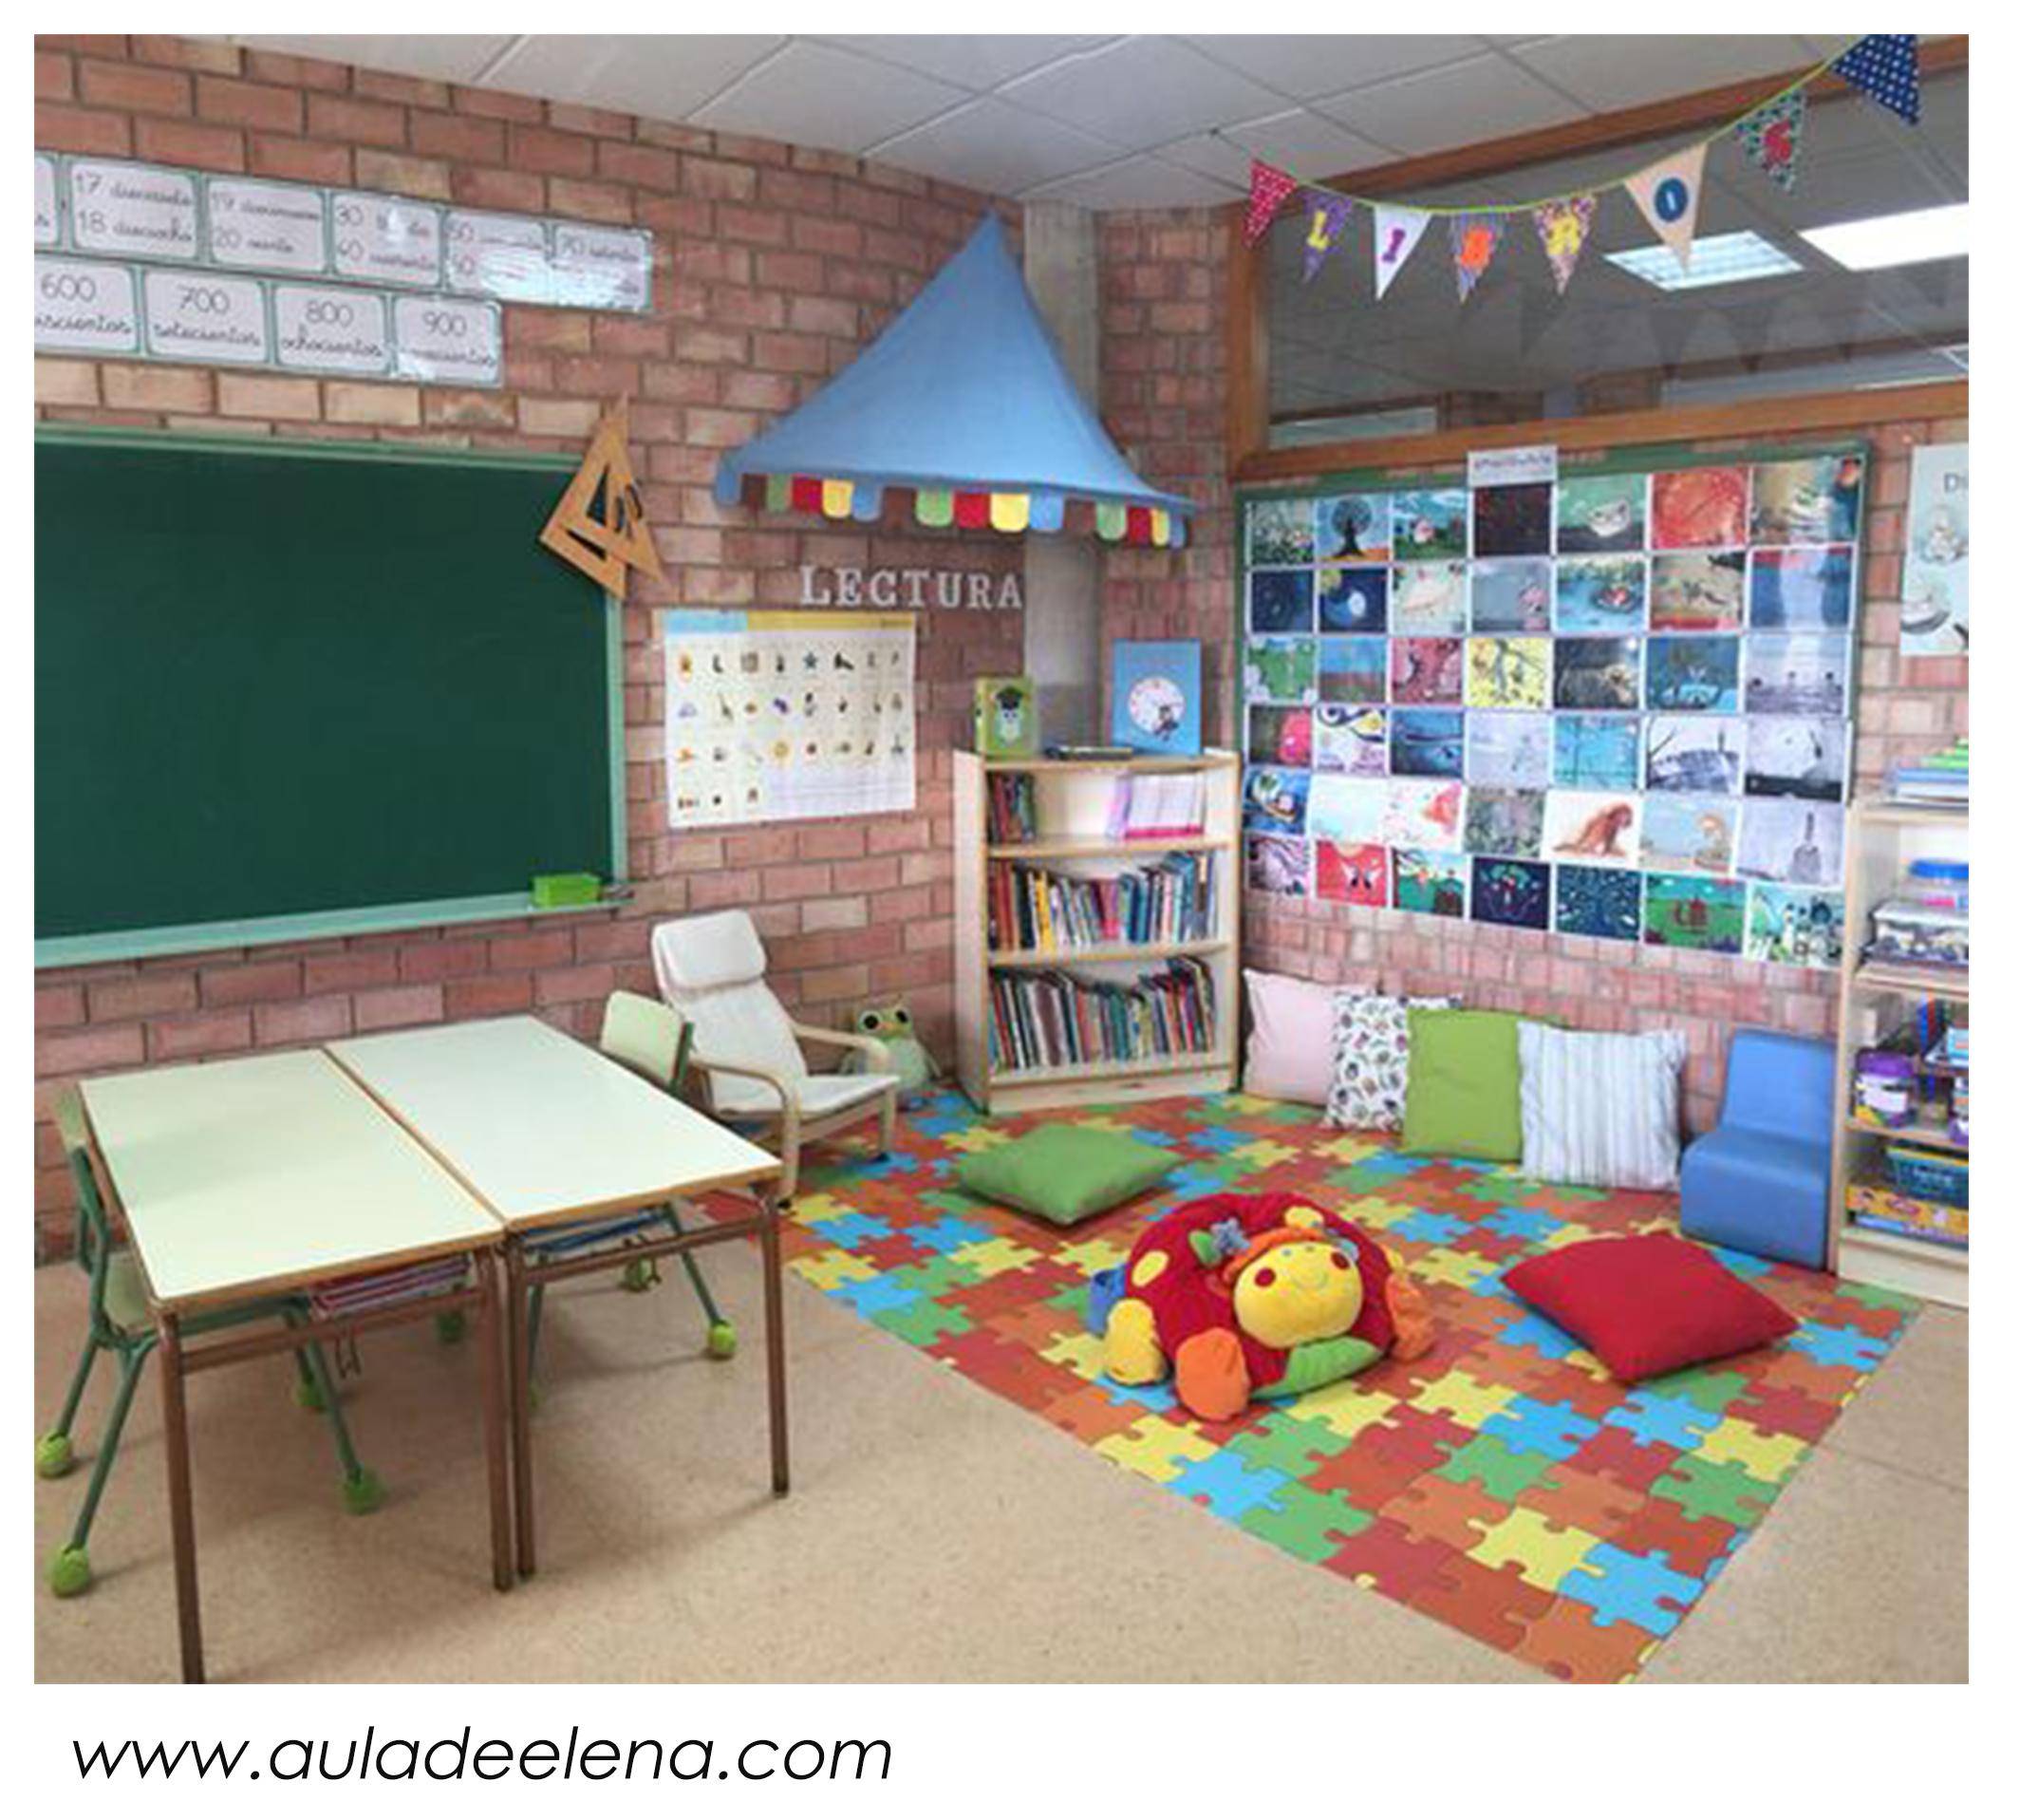 BibliOteca de aula: iDeas en imágenes - La libreta piruleta